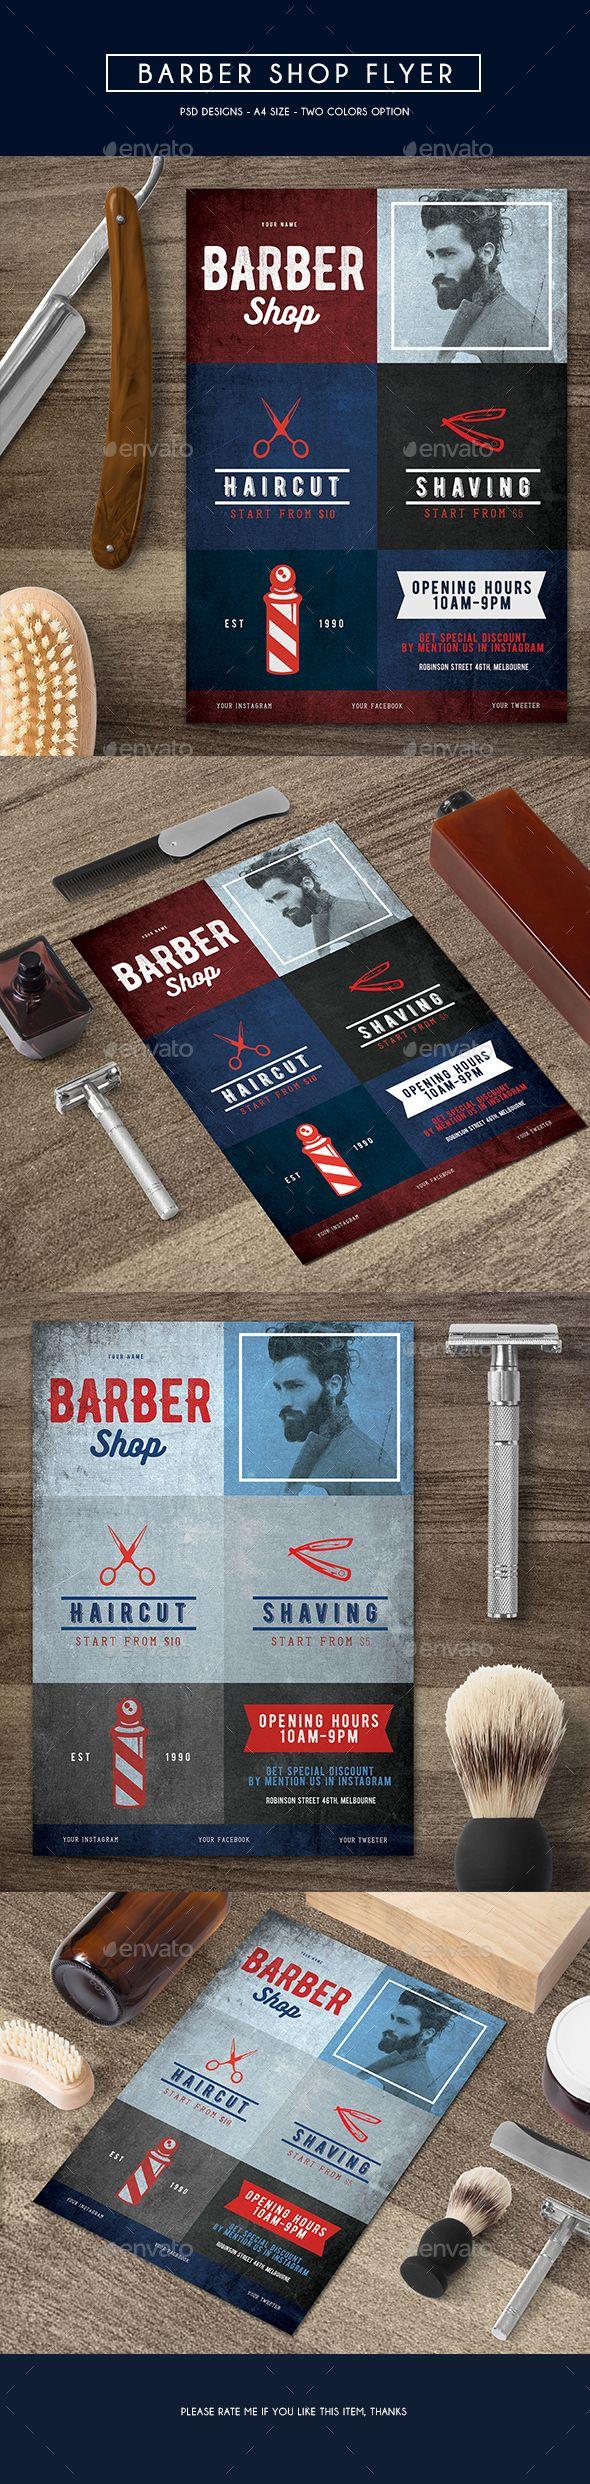 Barber Shop Flyer — Photoshop PSD #moustache #cut • Available here → https://graphicriver.net/item/barber-shop-flyer/15265888?ref=pxcr